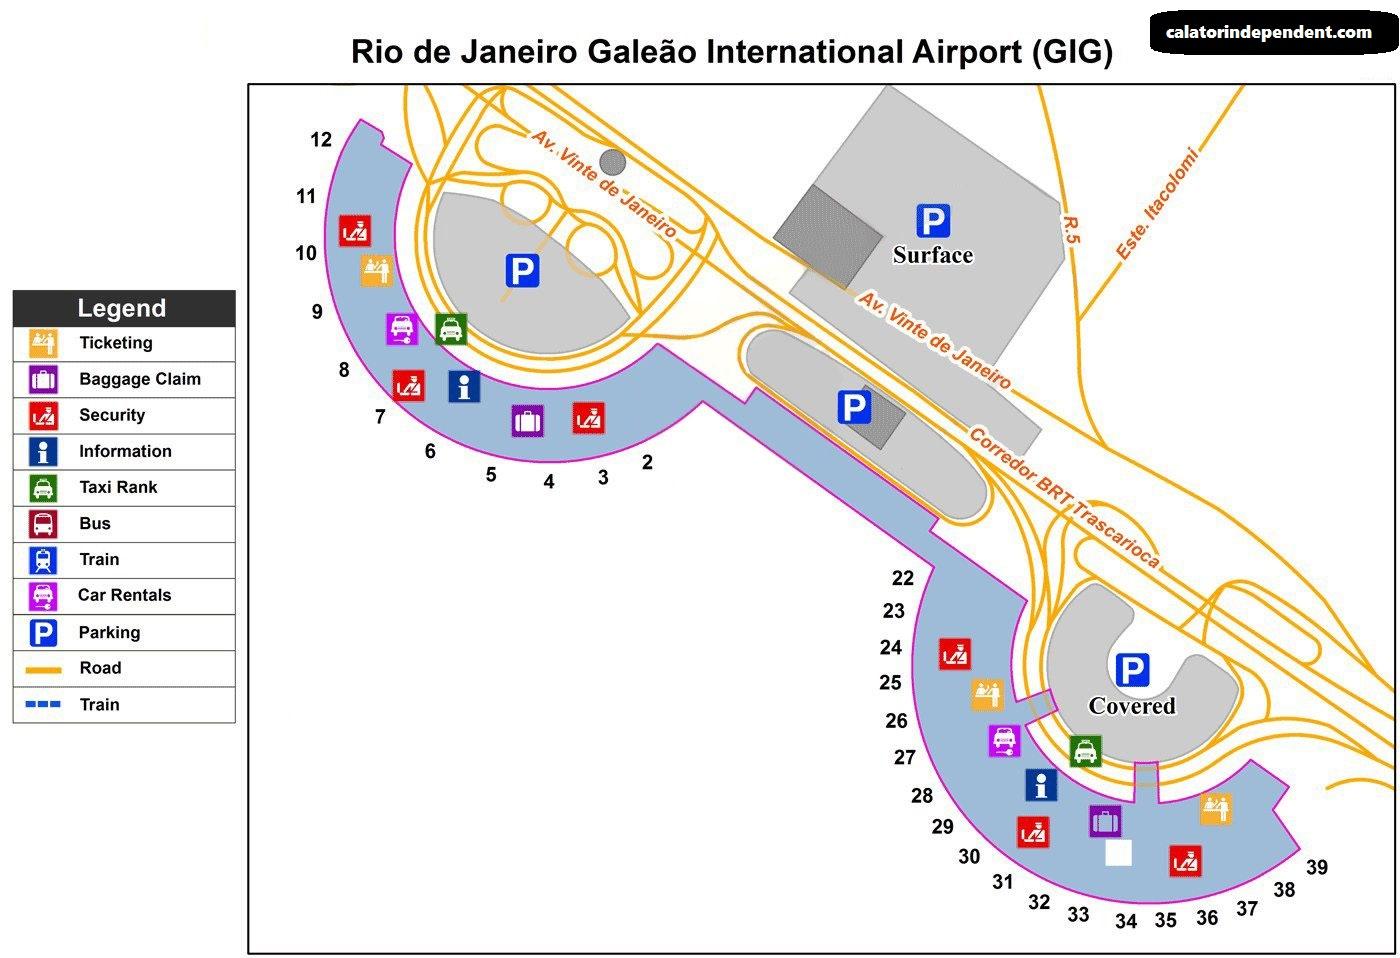 Terminalul aeroportului Rio de Janeiro